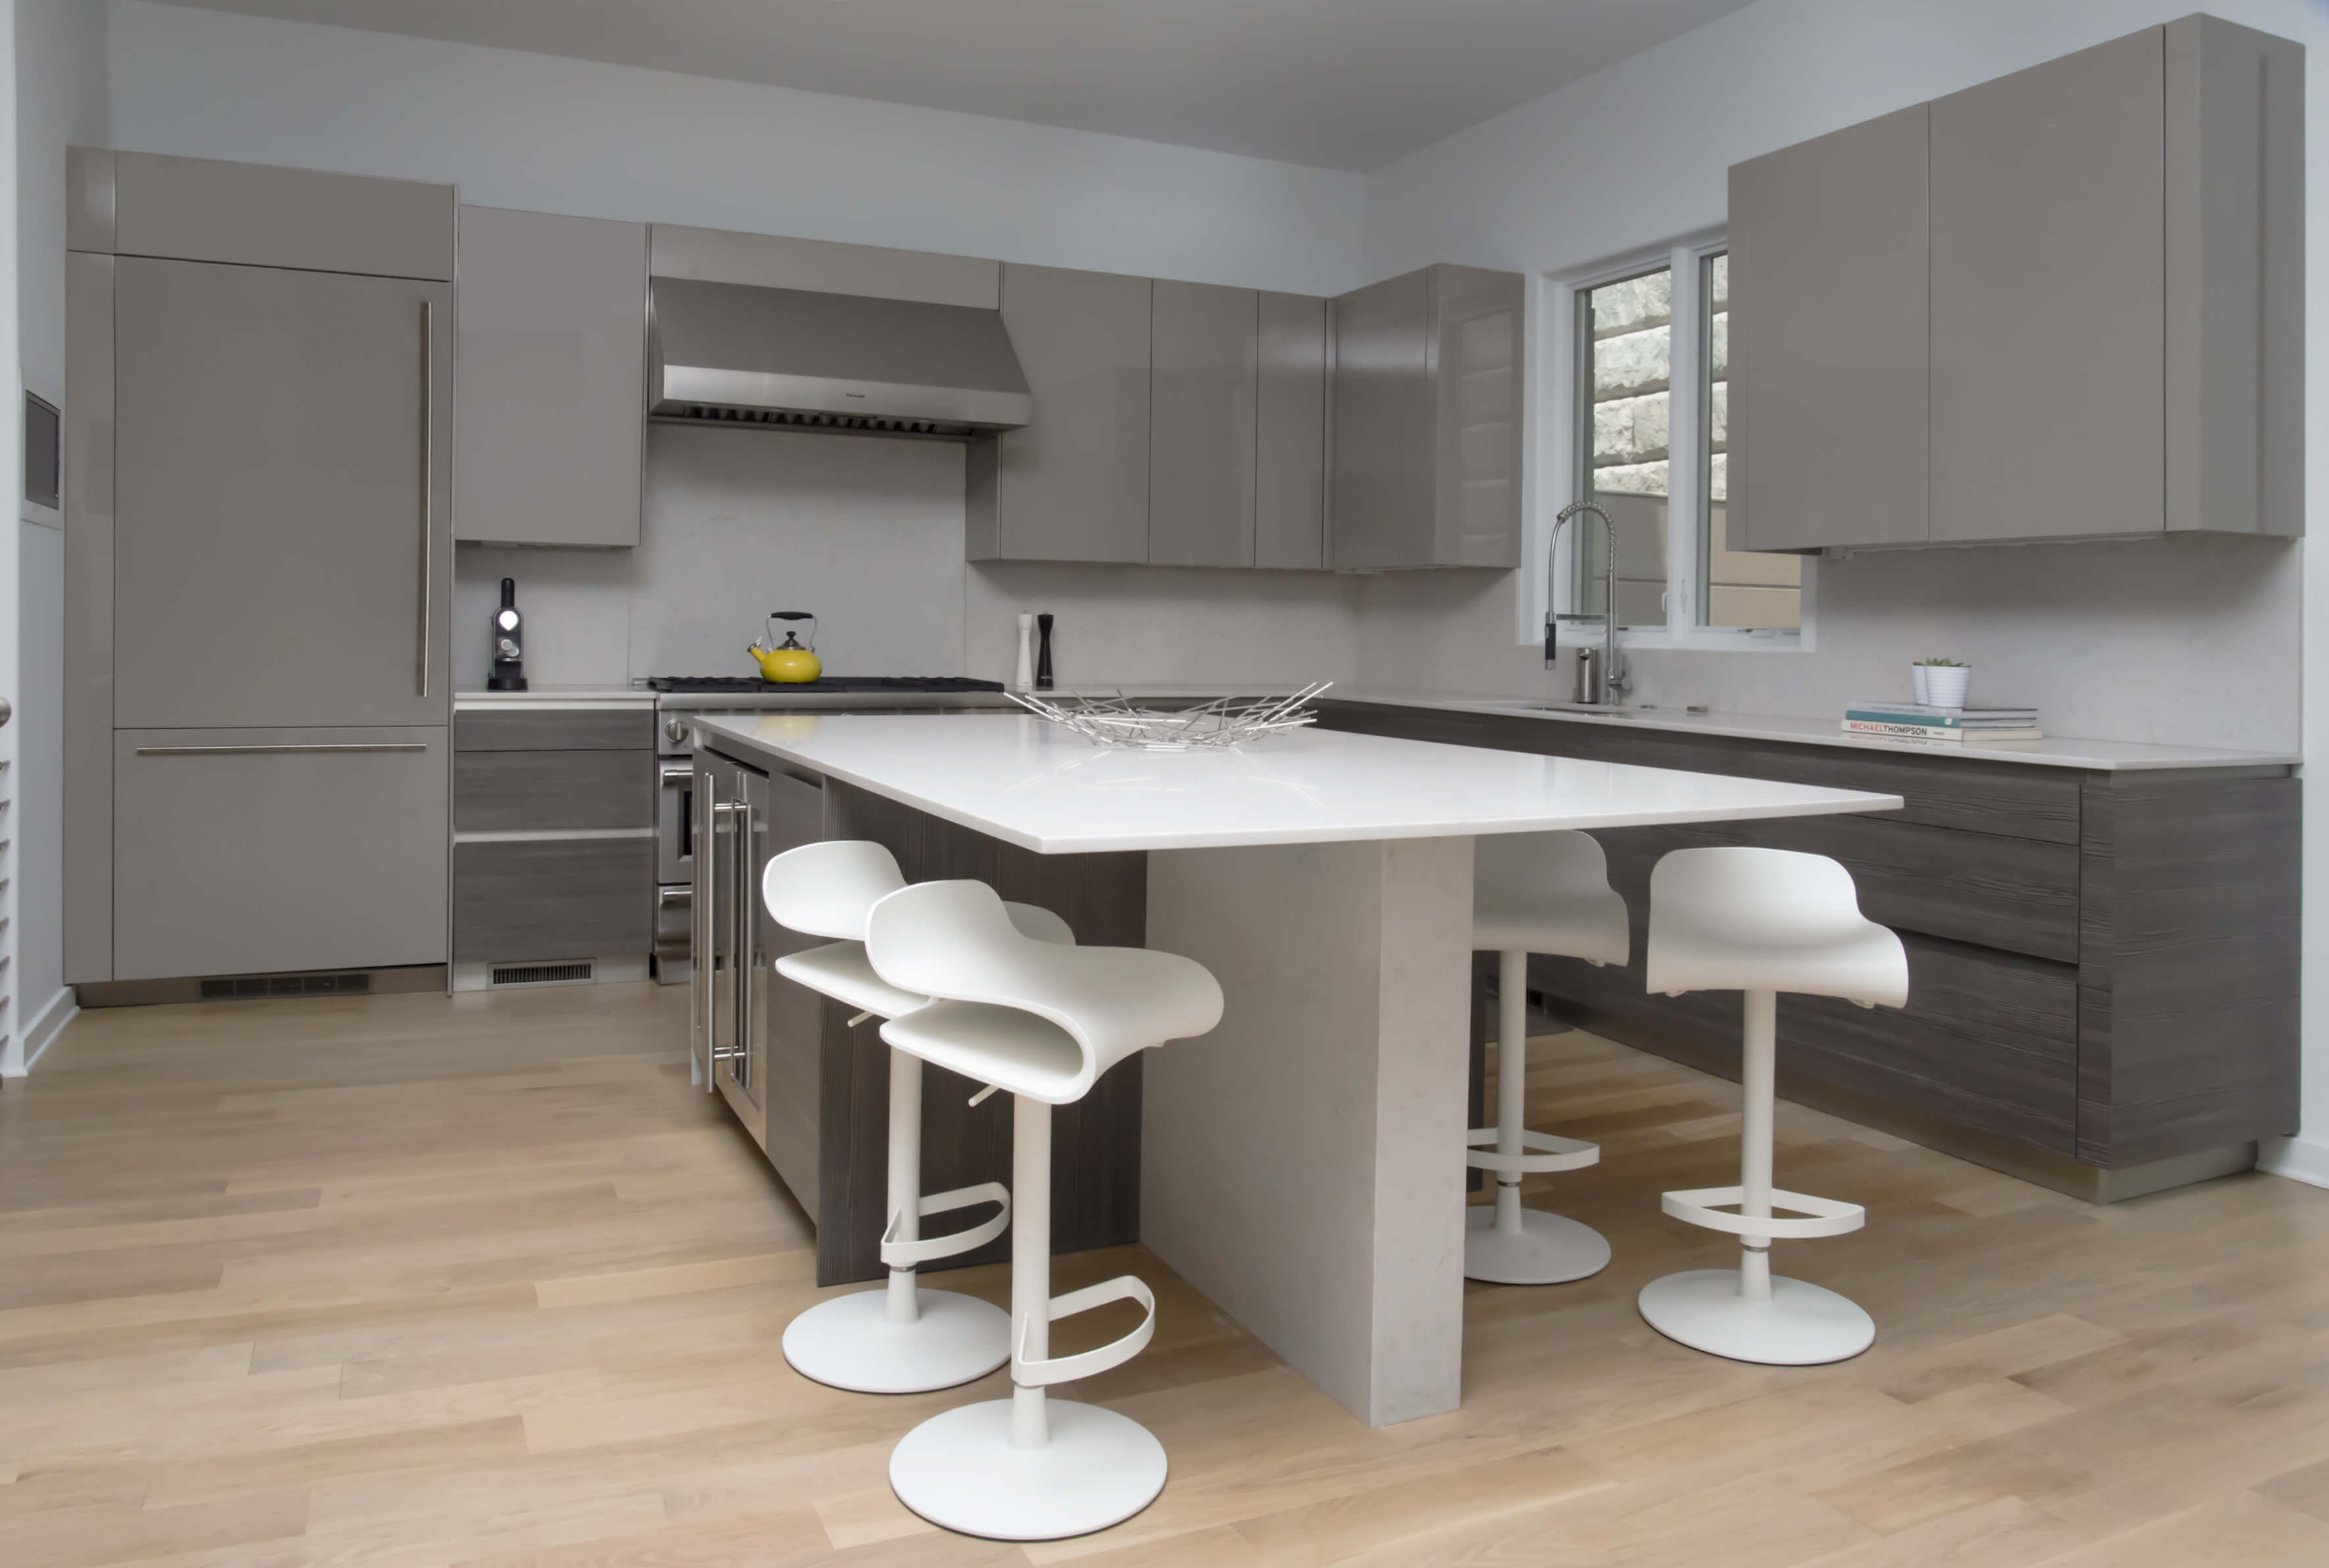 Modern and contemporary kitchen design by interior designer Renan Menninger of RM Interiors in Cincinnati.